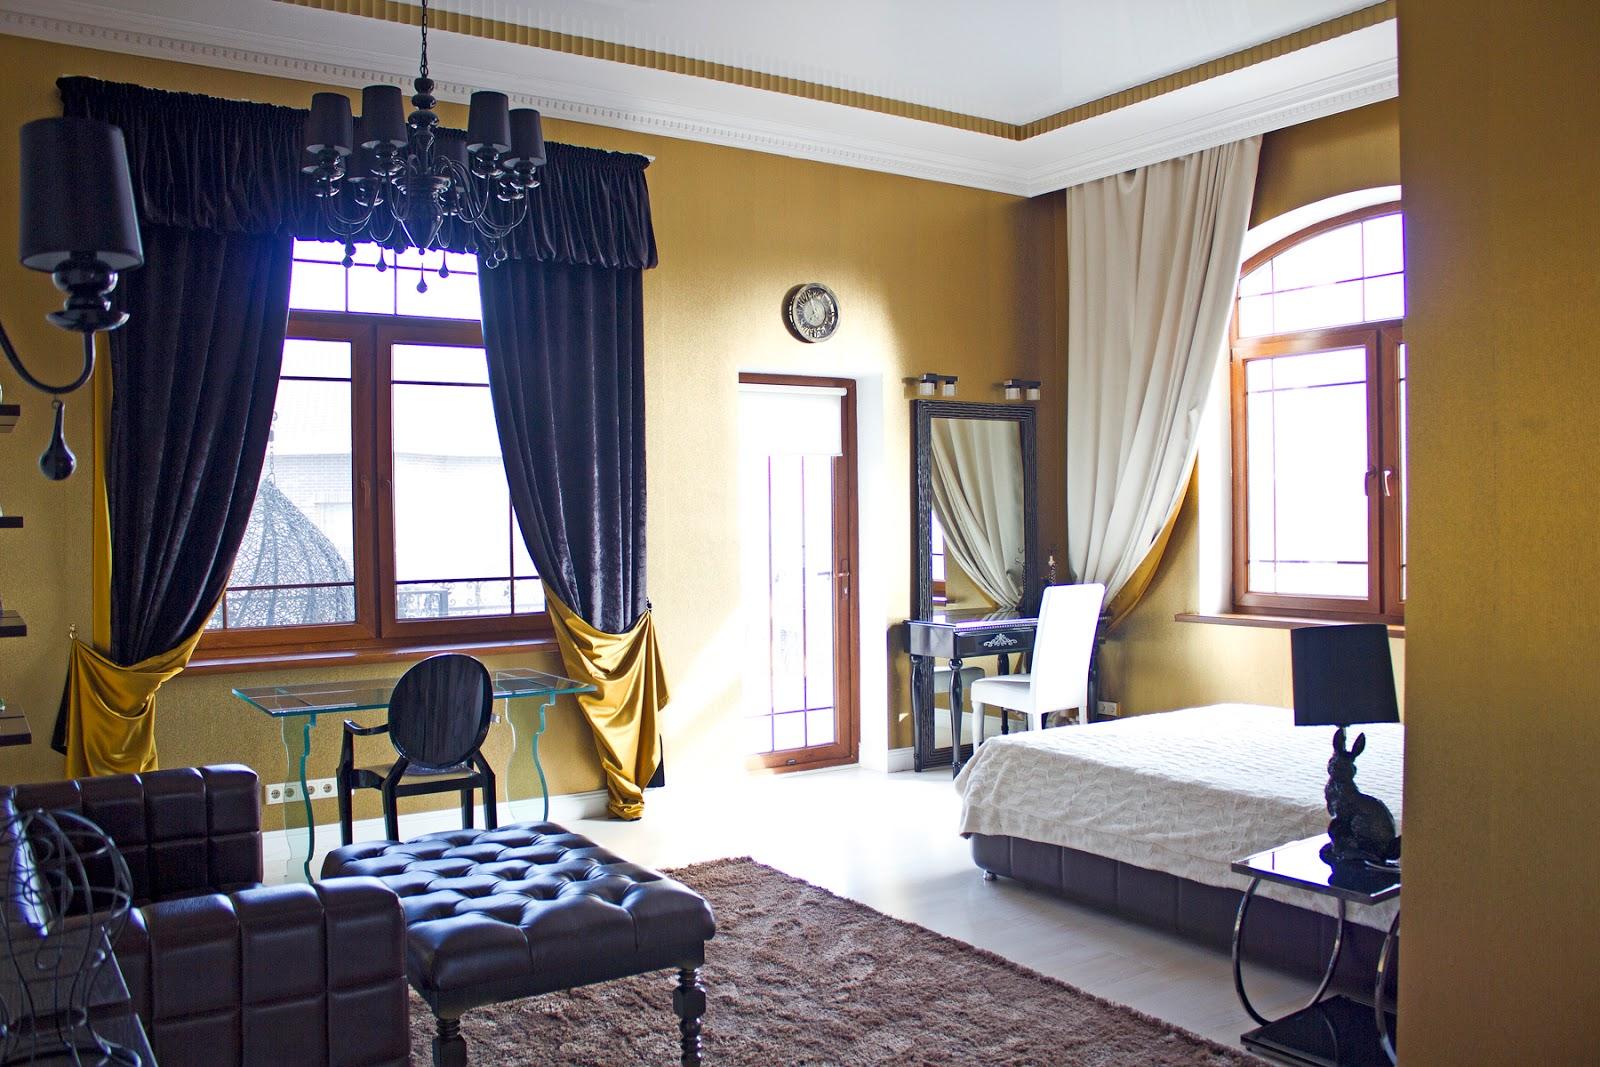 Svetlana Roma Design: Interior design by Svetlana Roma / Bedroom / New project / Inspired by LV